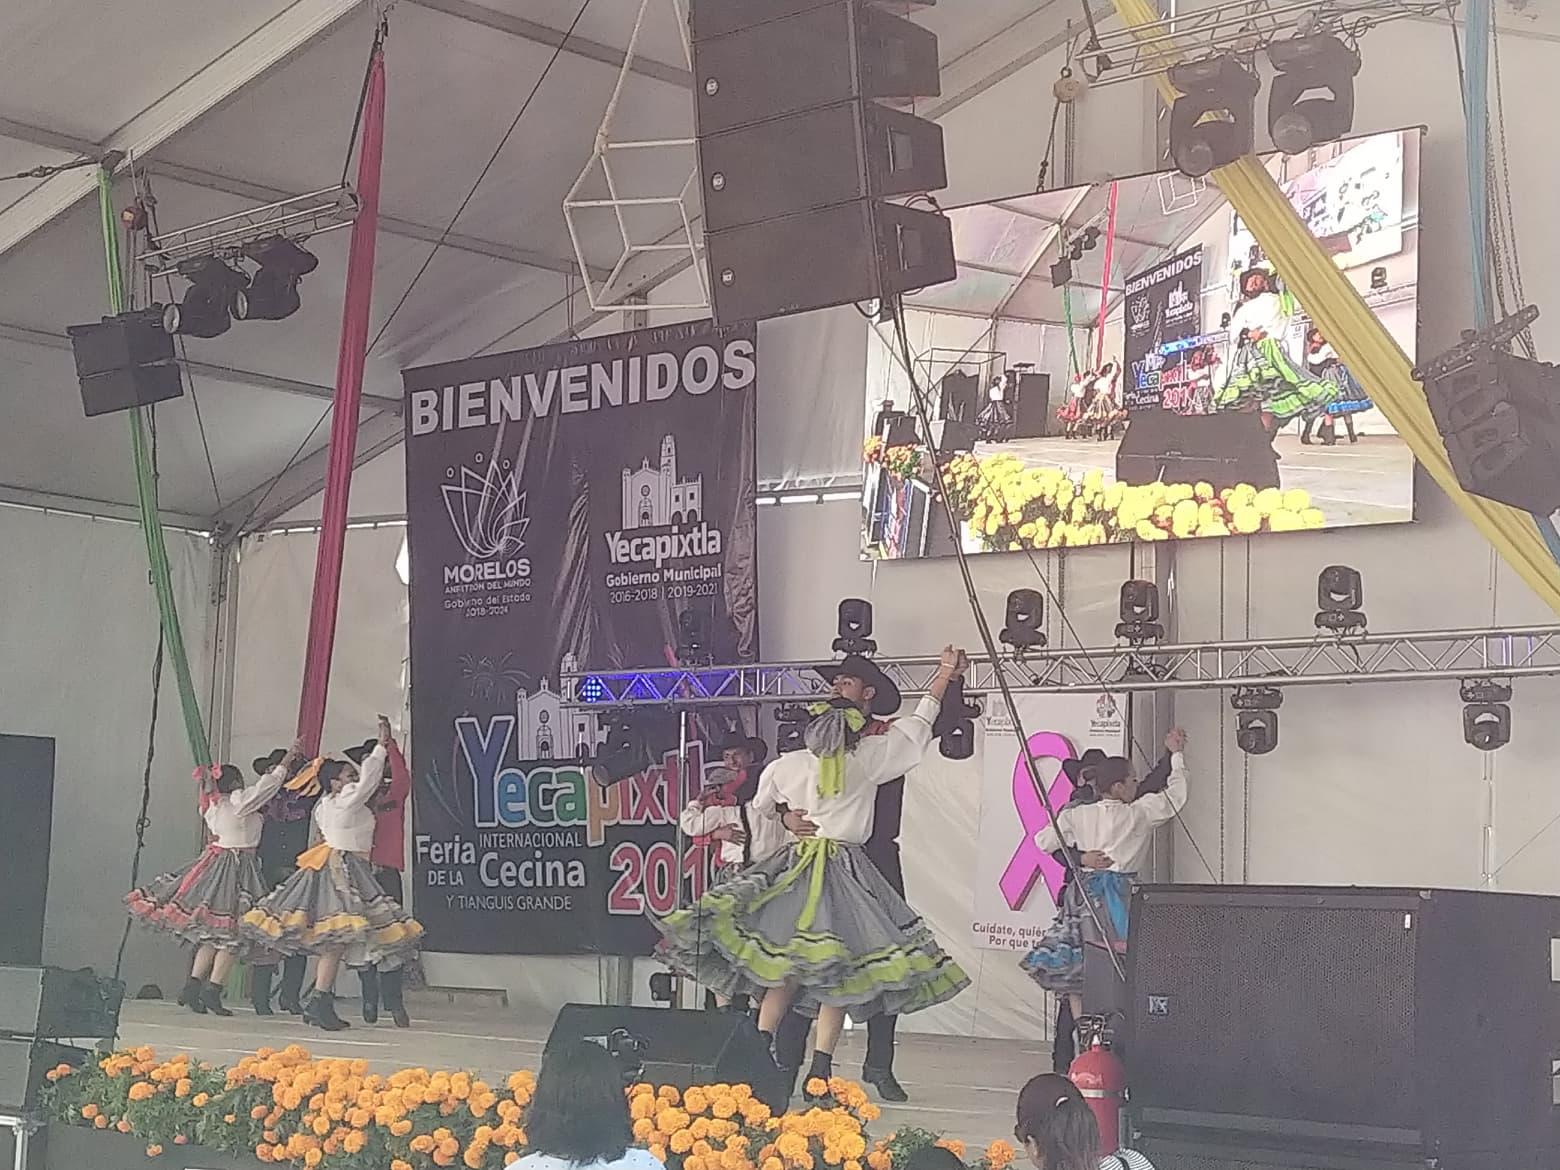 International Cecina Fair in Yecapitxla